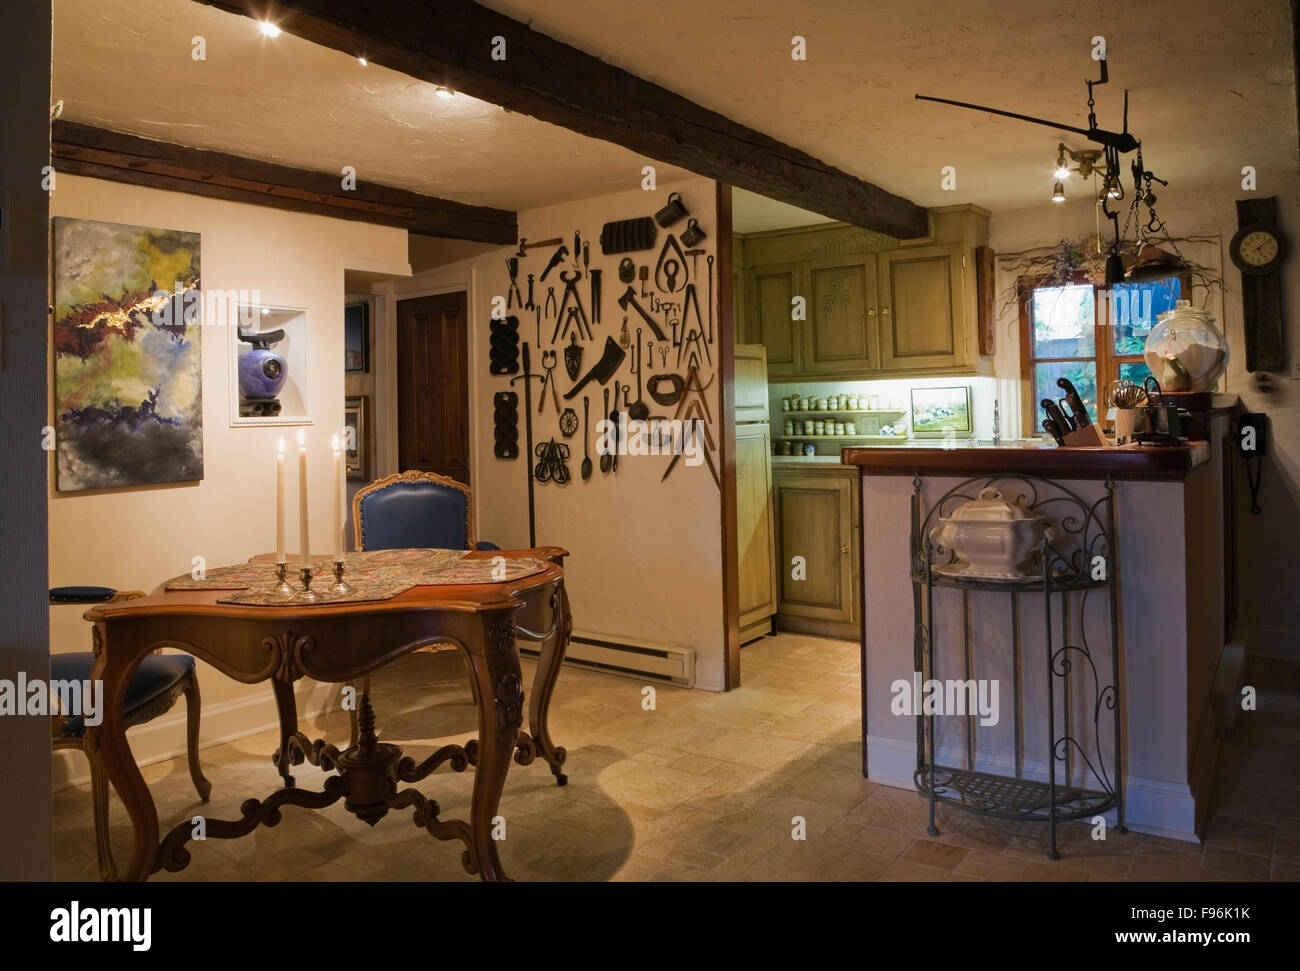 Incredible Antique Breakfast Table And Blue Leather Upholstered High Inzonedesignstudio Interior Chair Design Inzonedesignstudiocom